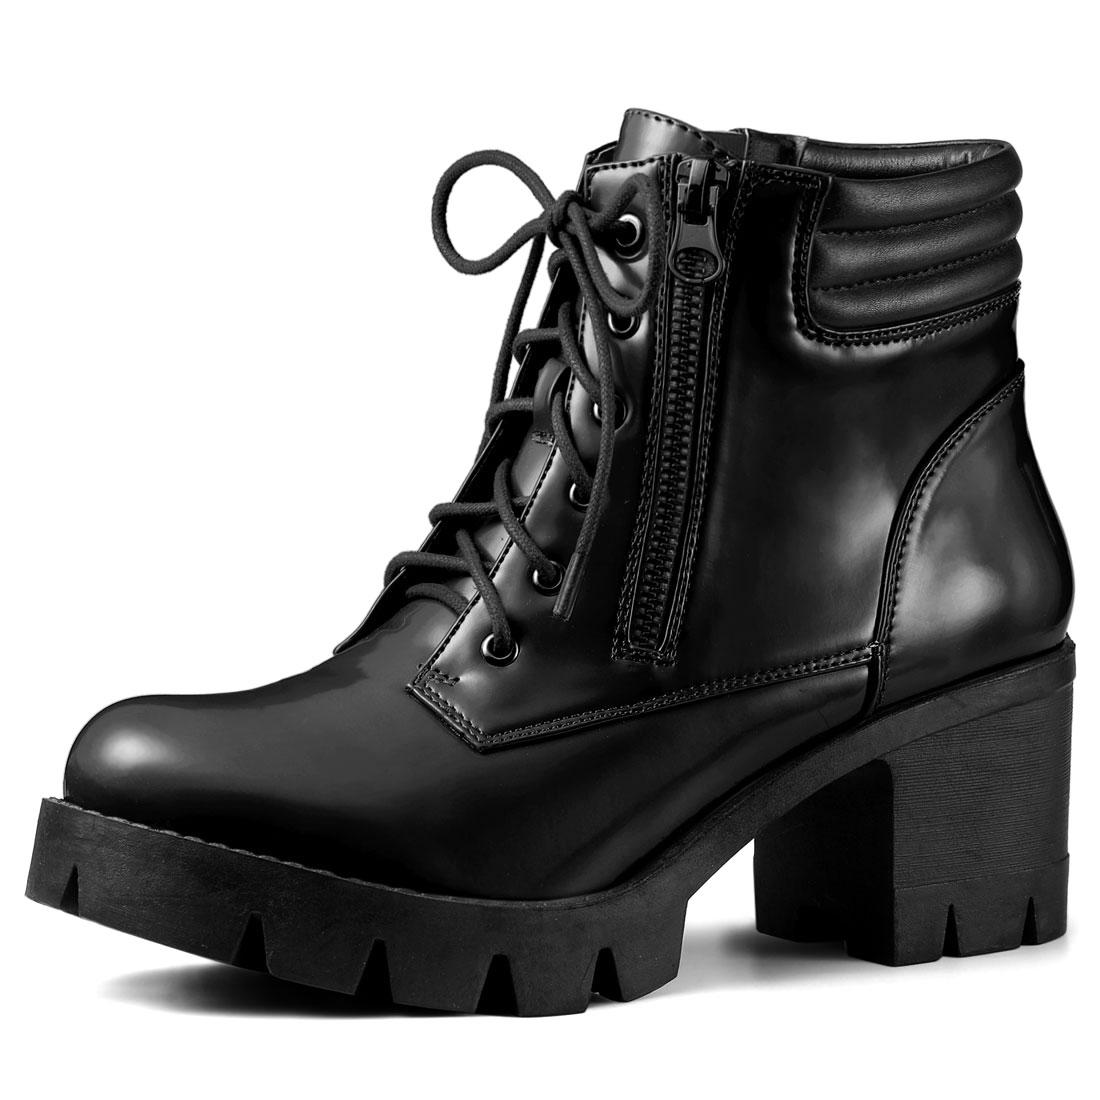 Allegra-K-Women-039-s-Round-Toe-Side-Zipper-Combat-Block-Heel-Ankle-Boots thumbnail 8